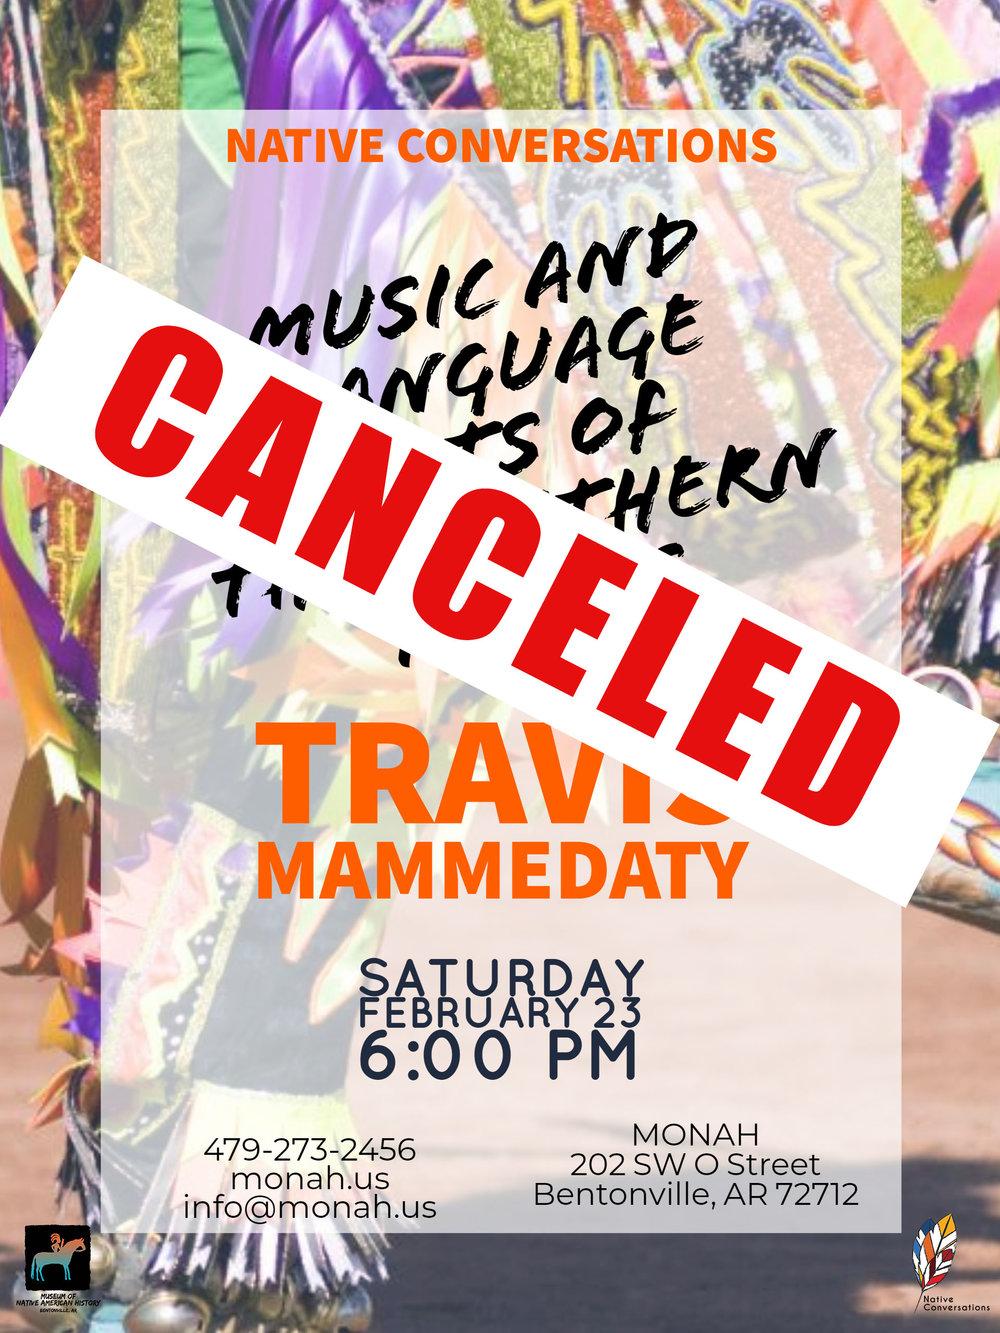 Travis Mammedaty Leaflet (1) cancelled.jpg